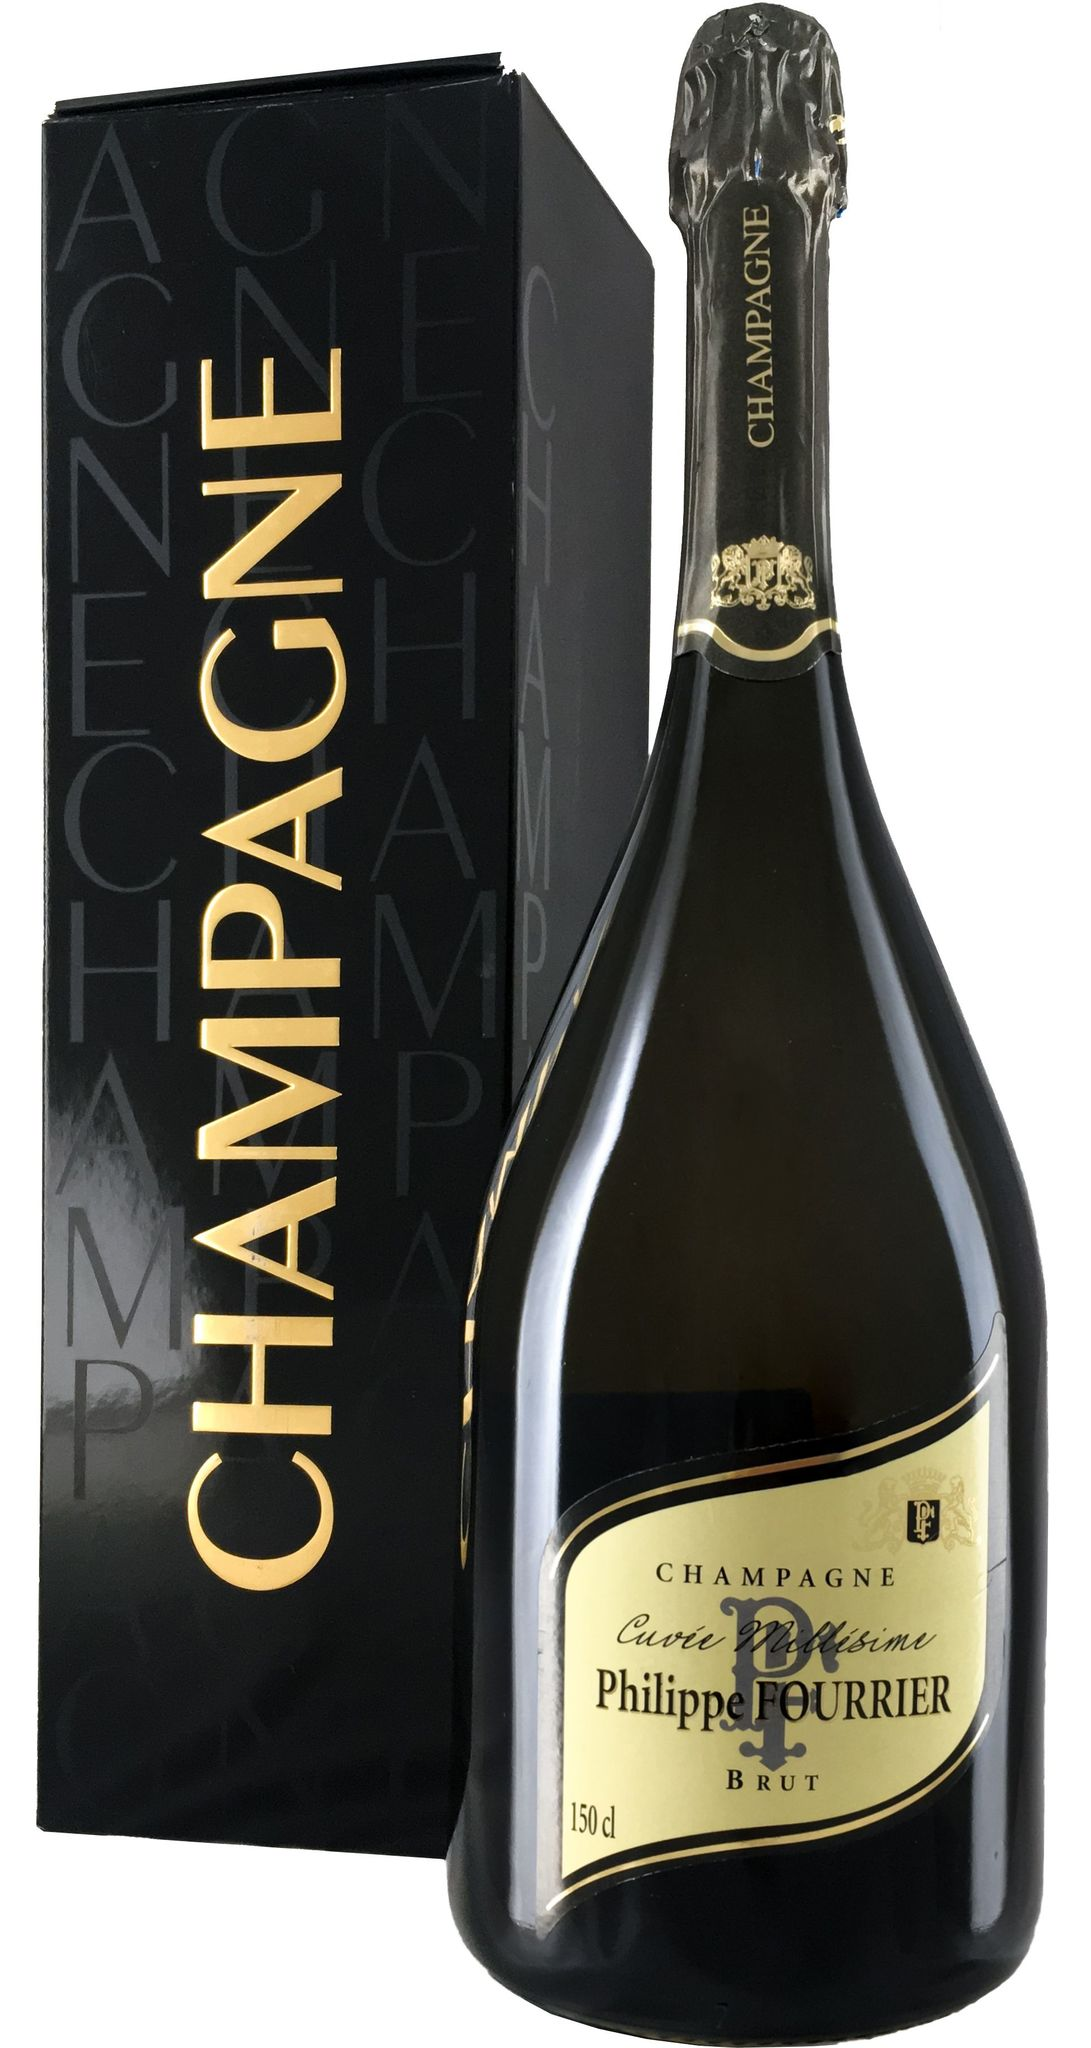 Philippe Fourrier Brut Champagne Cuvee Millesime 2013 1.5л